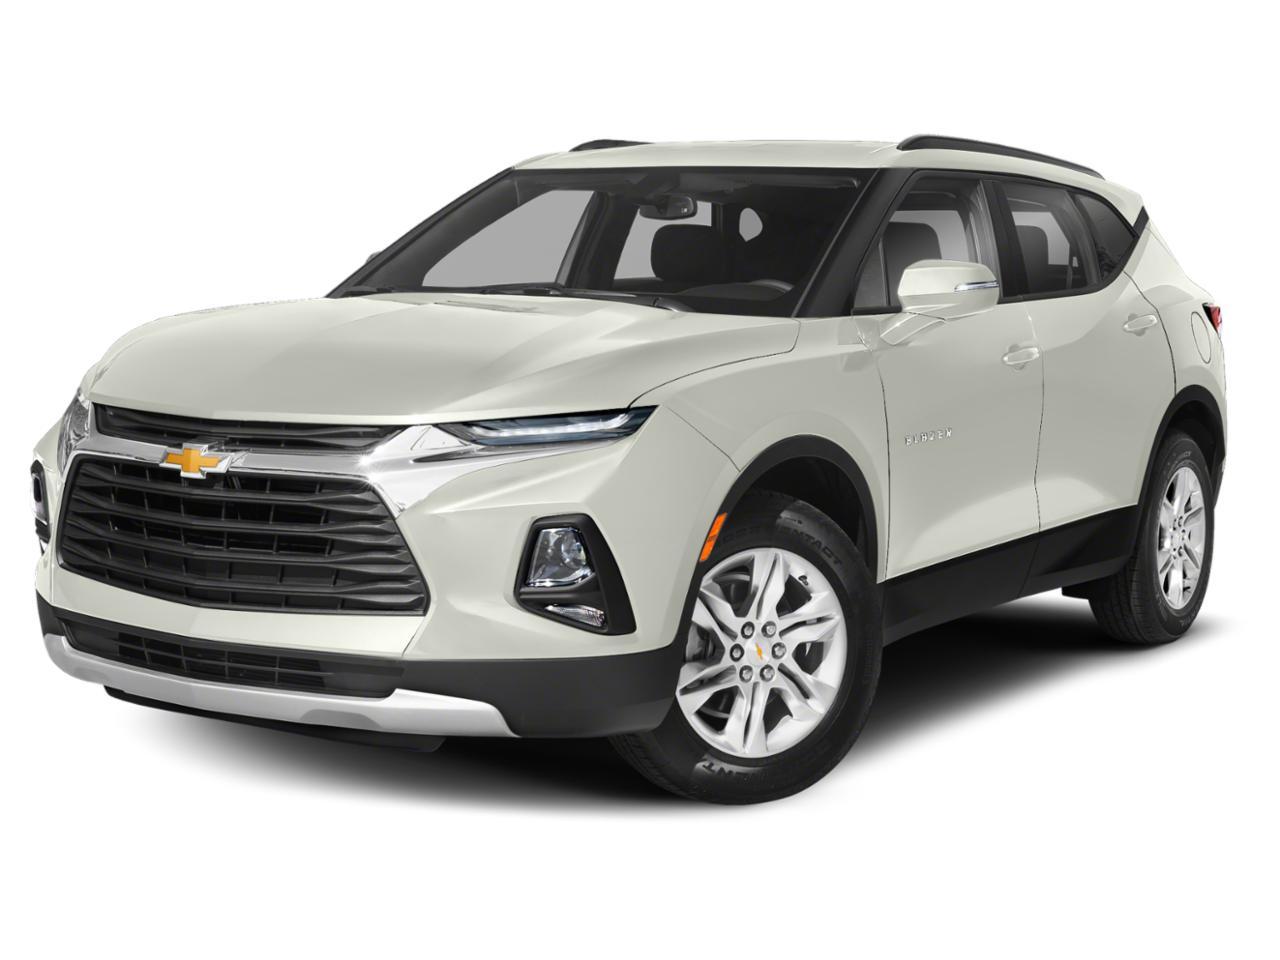 2020 Chevrolet Blazer PREMIER SUV Slide 0